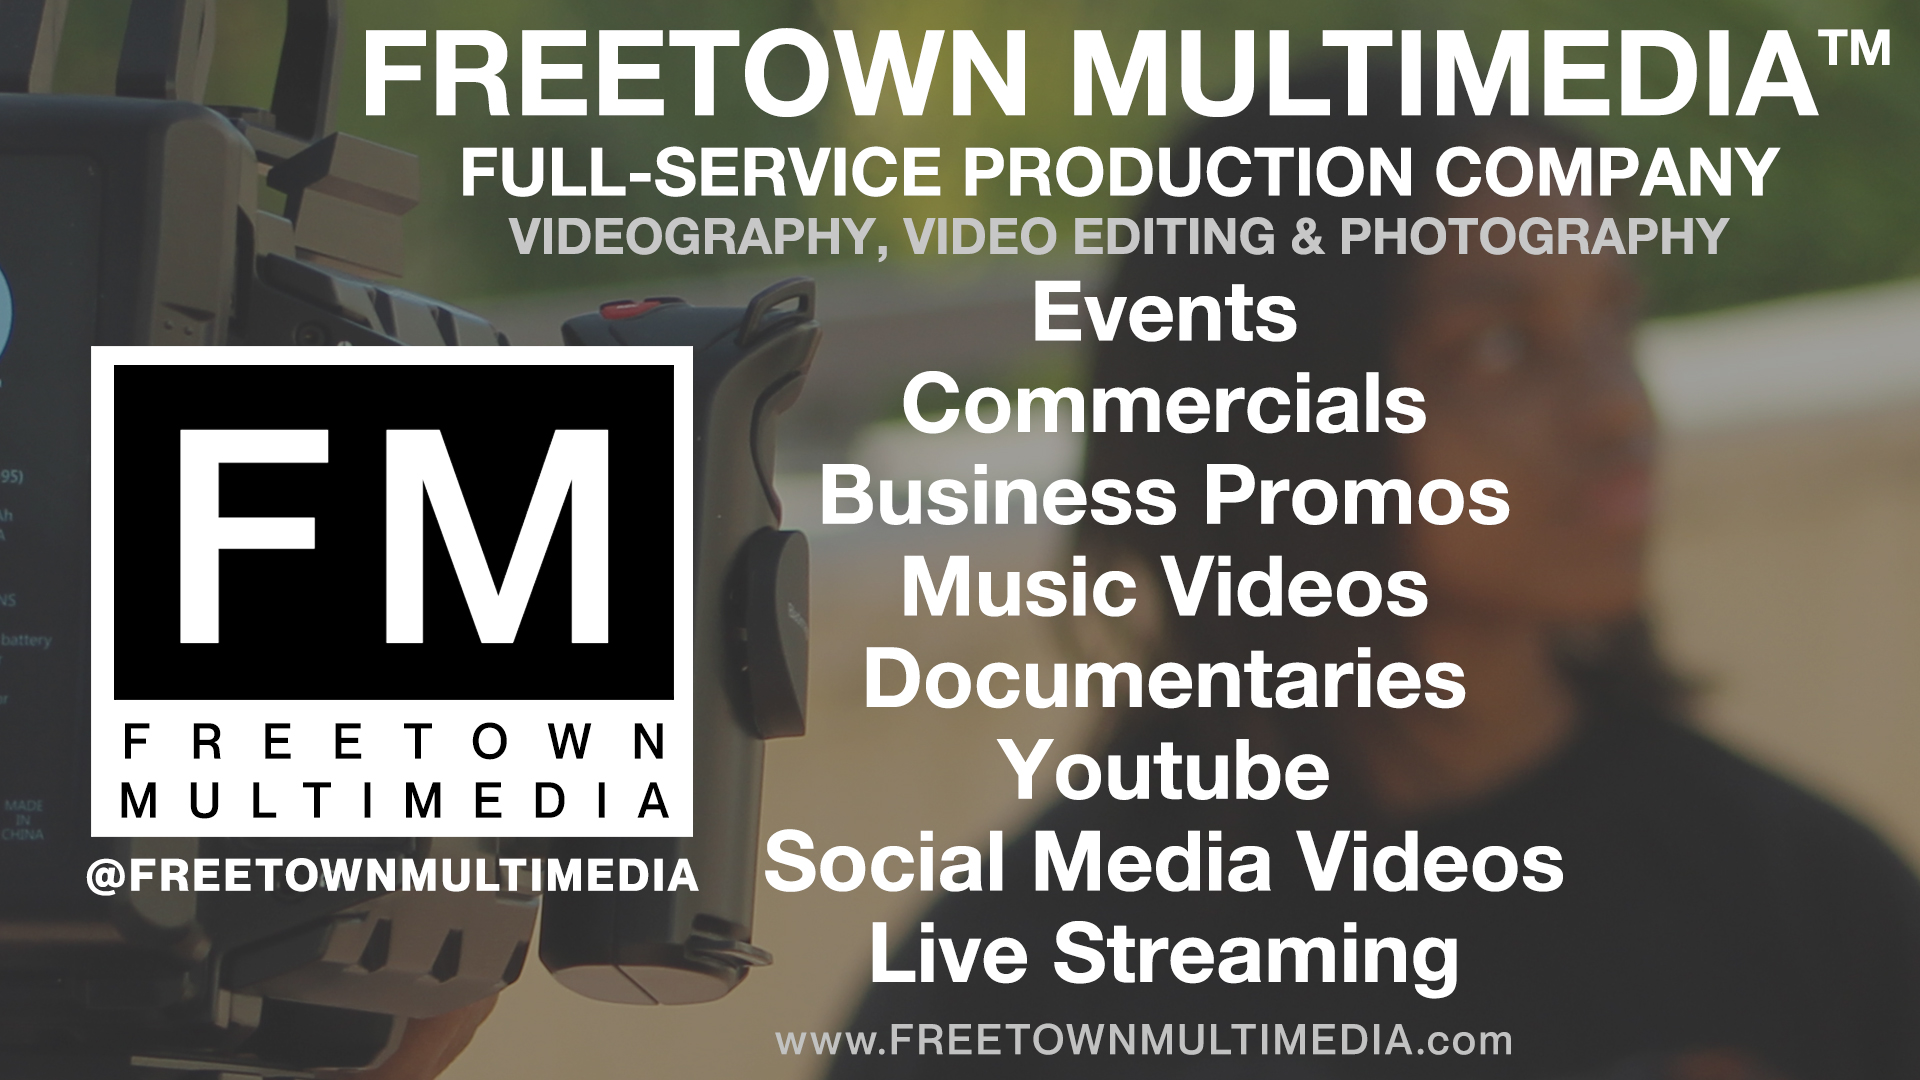 Freetown-Multimedia-Promo-Graphic.jpg